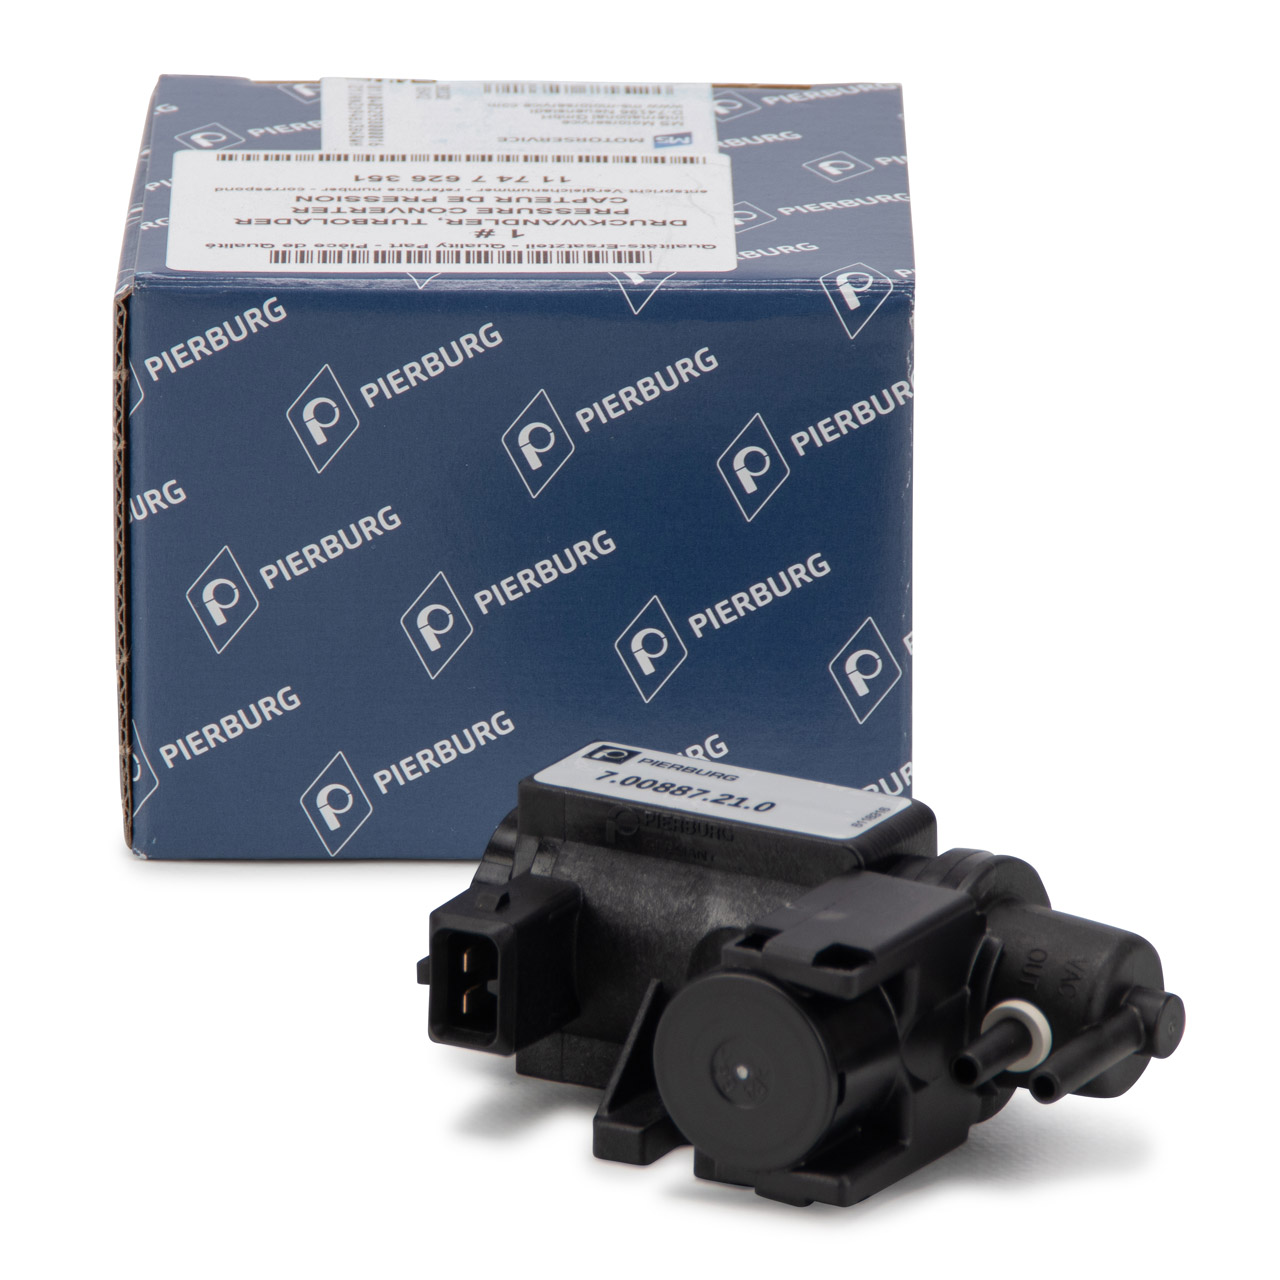 PIERBURG 7.00887.21.0 Druckwandler Magnetventil Turbolader BMW 1er F20 F21 11747626351